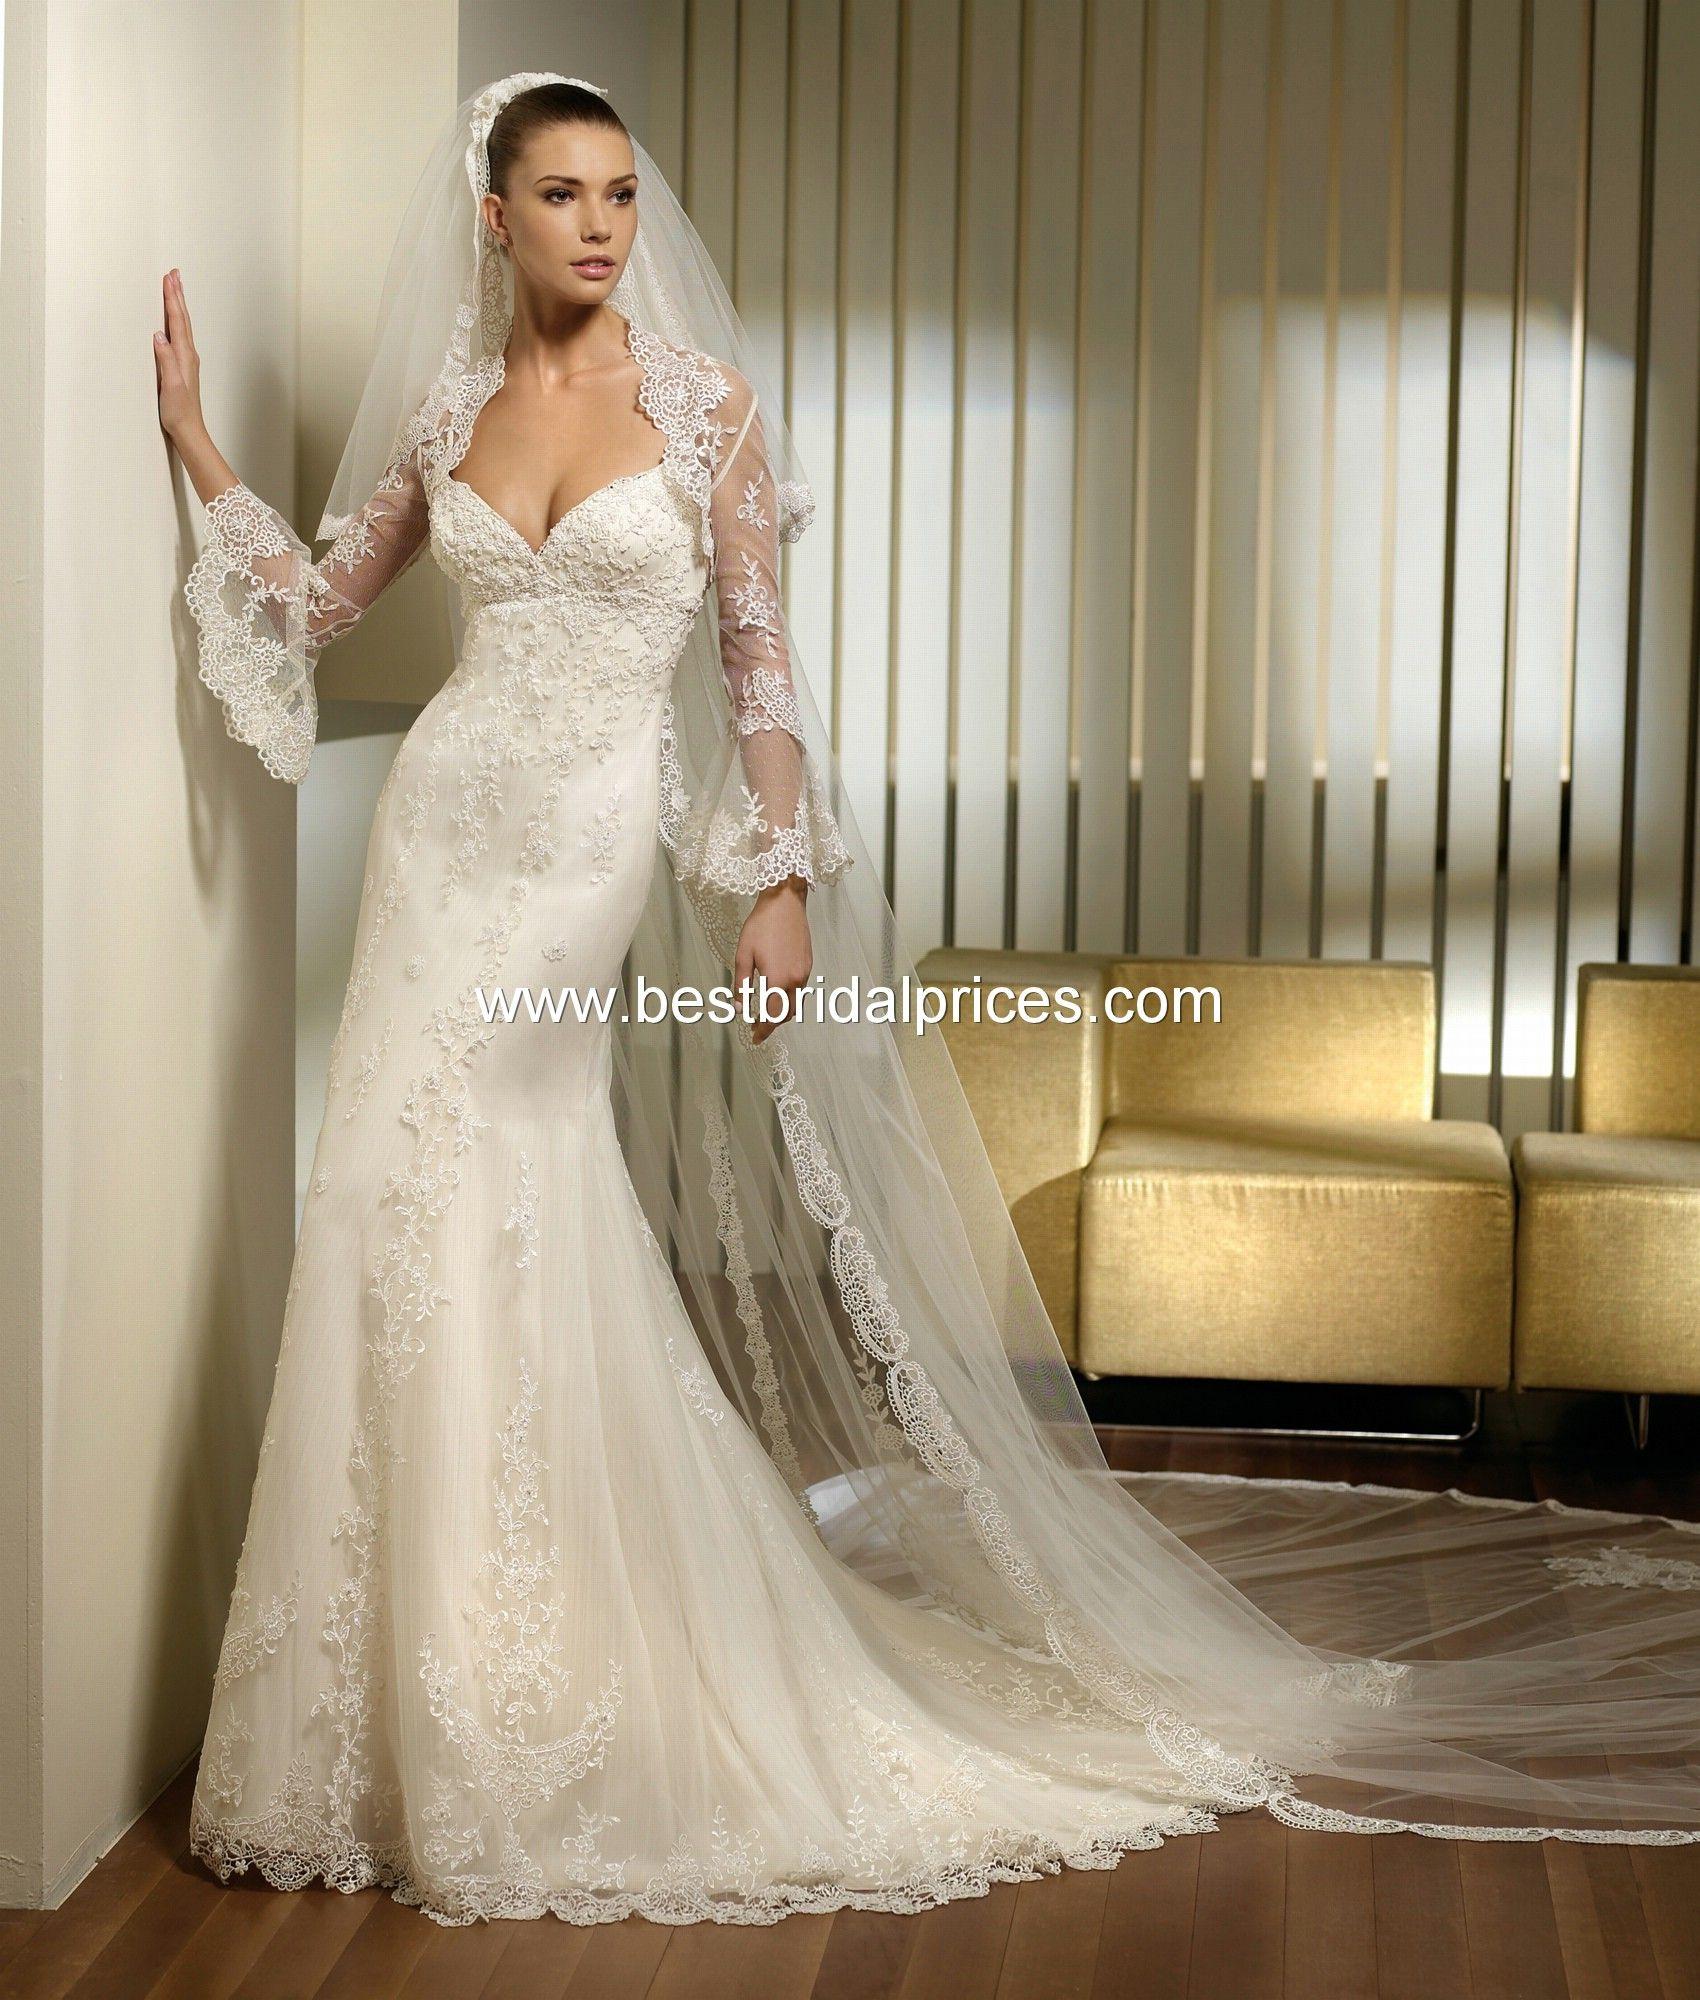 San Patrick wedding gown - Prado   Wedding gown   Pinterest ...